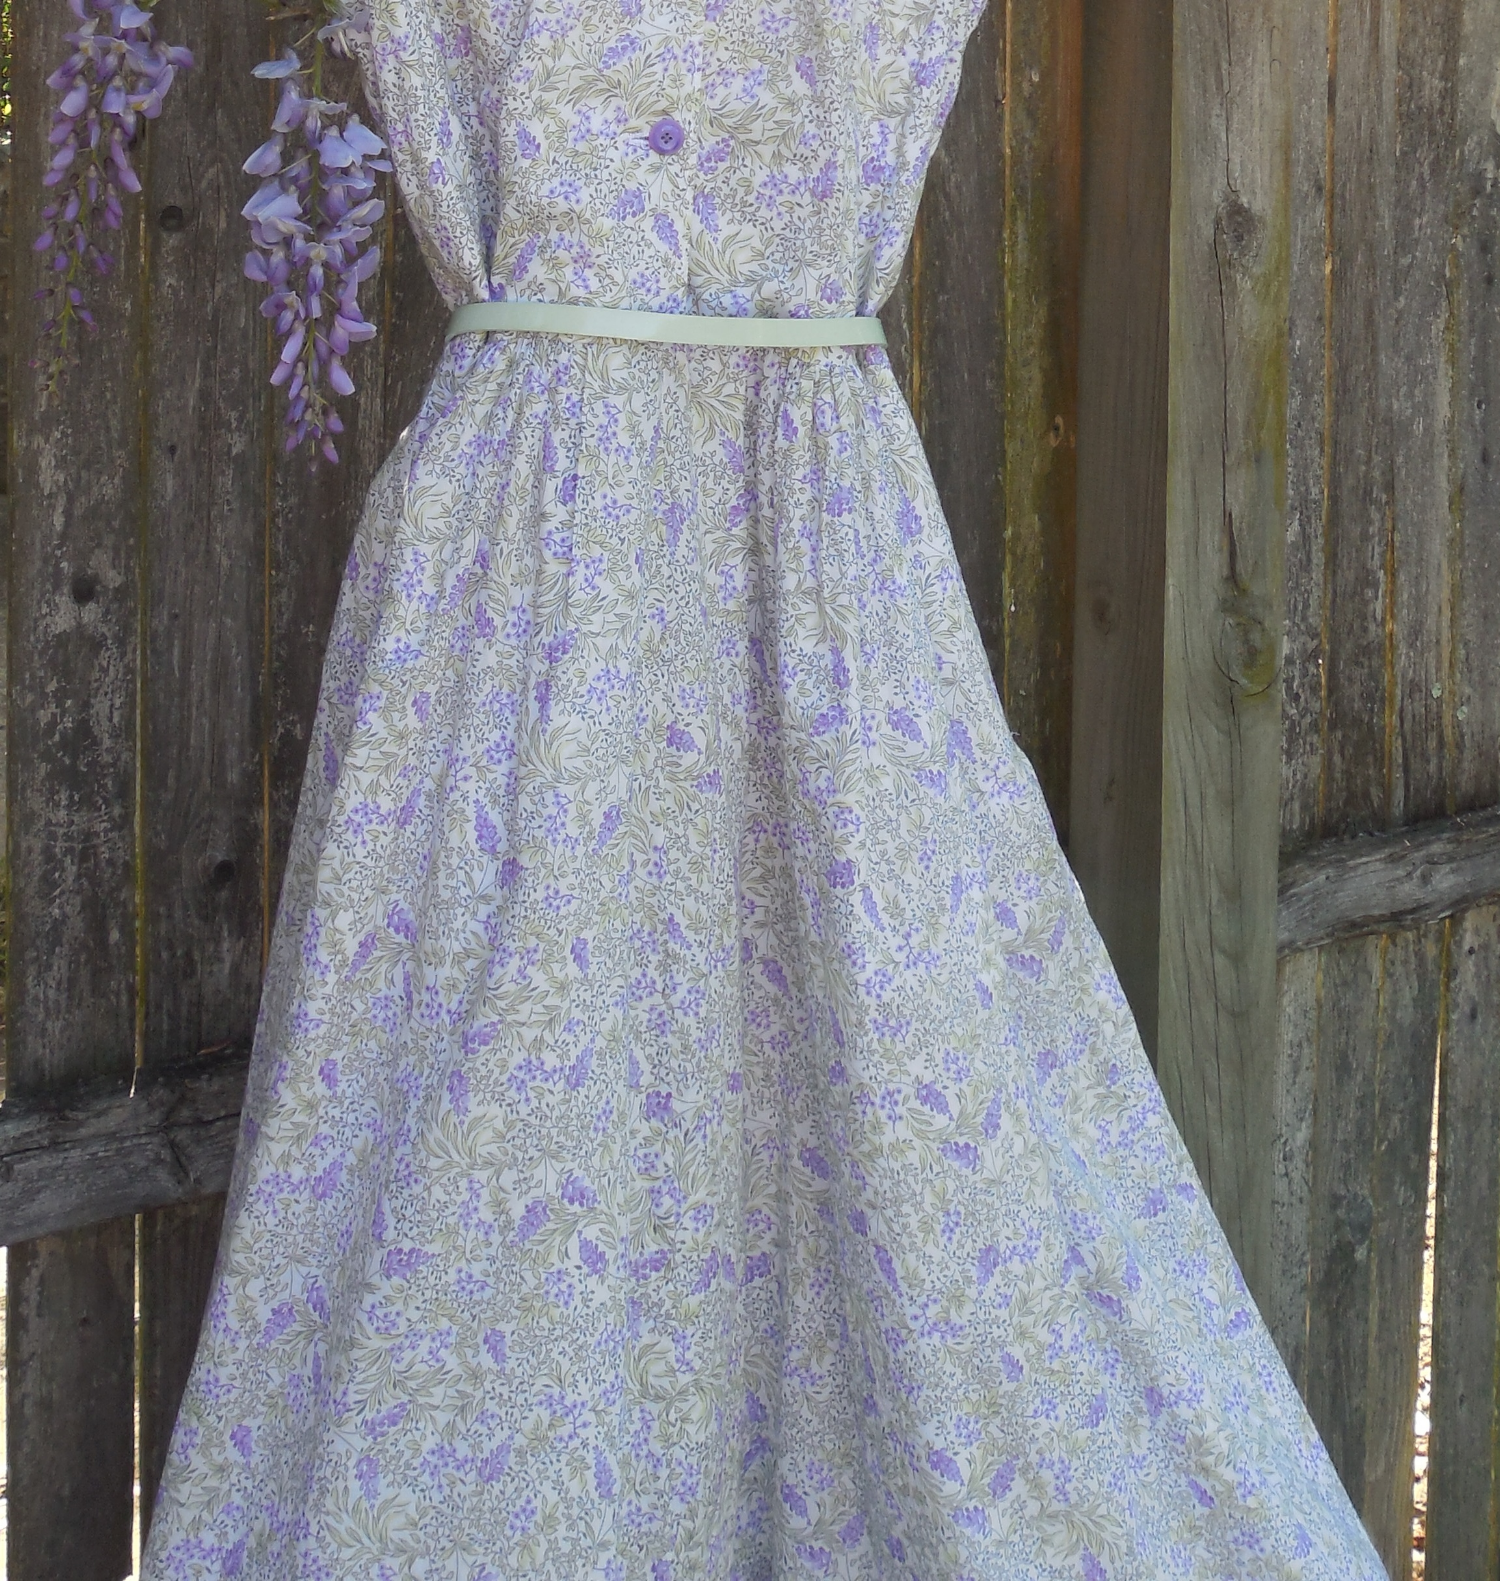 Detail from Anikka Becker  shirtwaist dress in wisteria cotton lawn